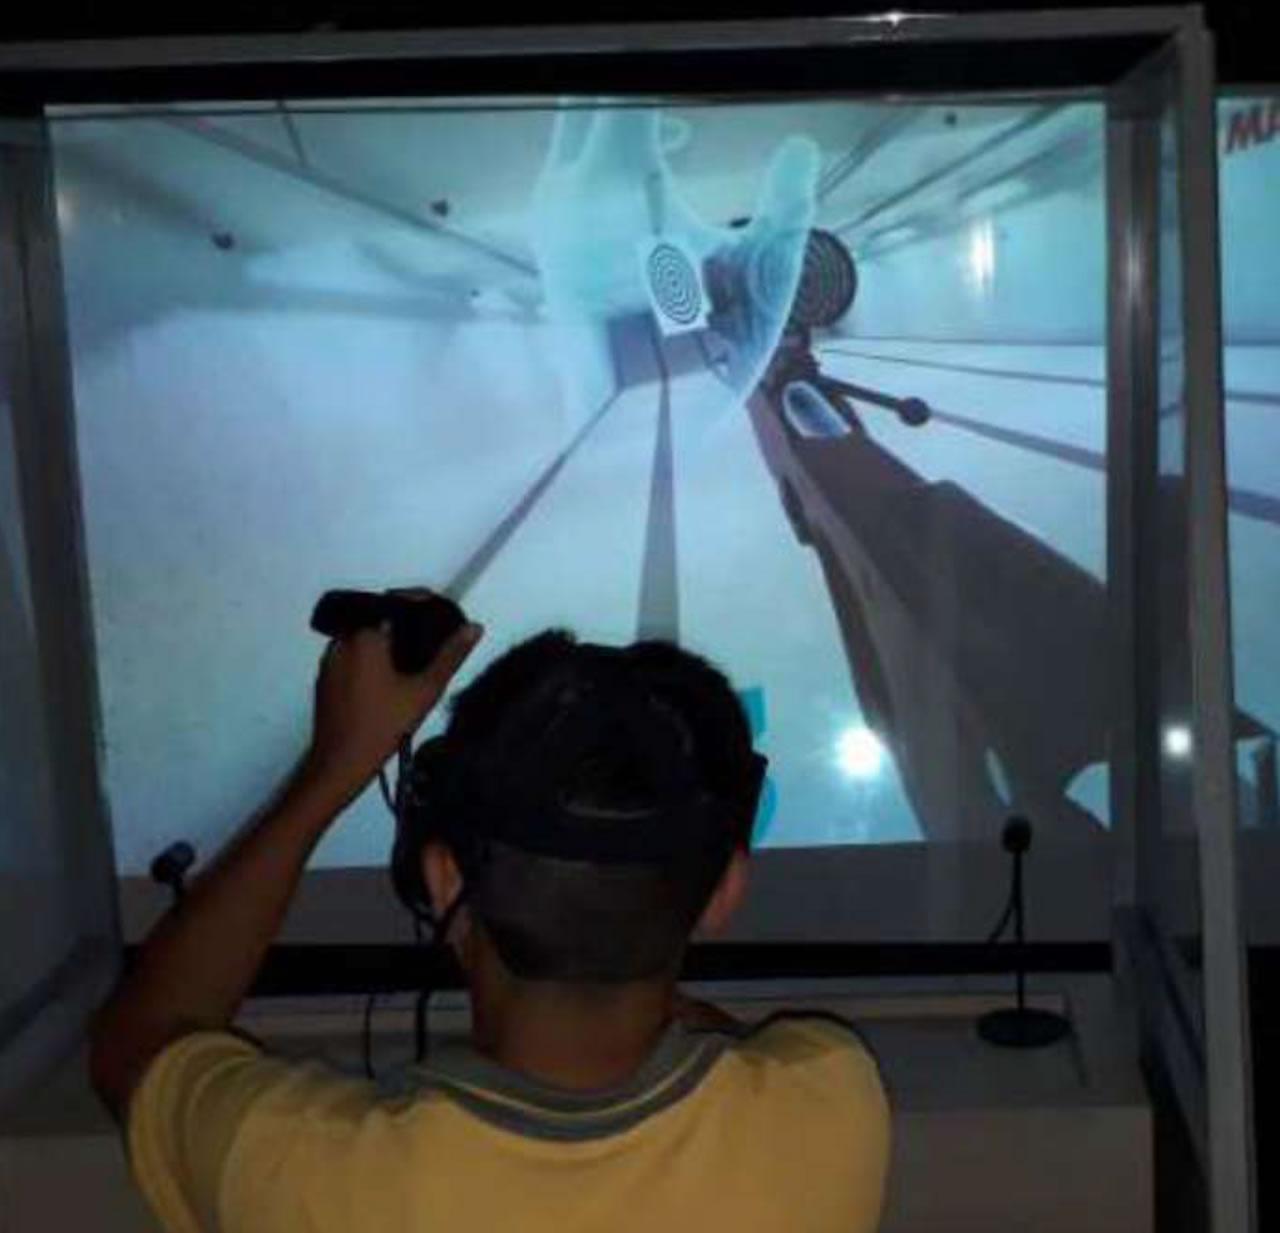 CSI Olay Yeri İnceleme Konsepti - VR Sanal Poligon